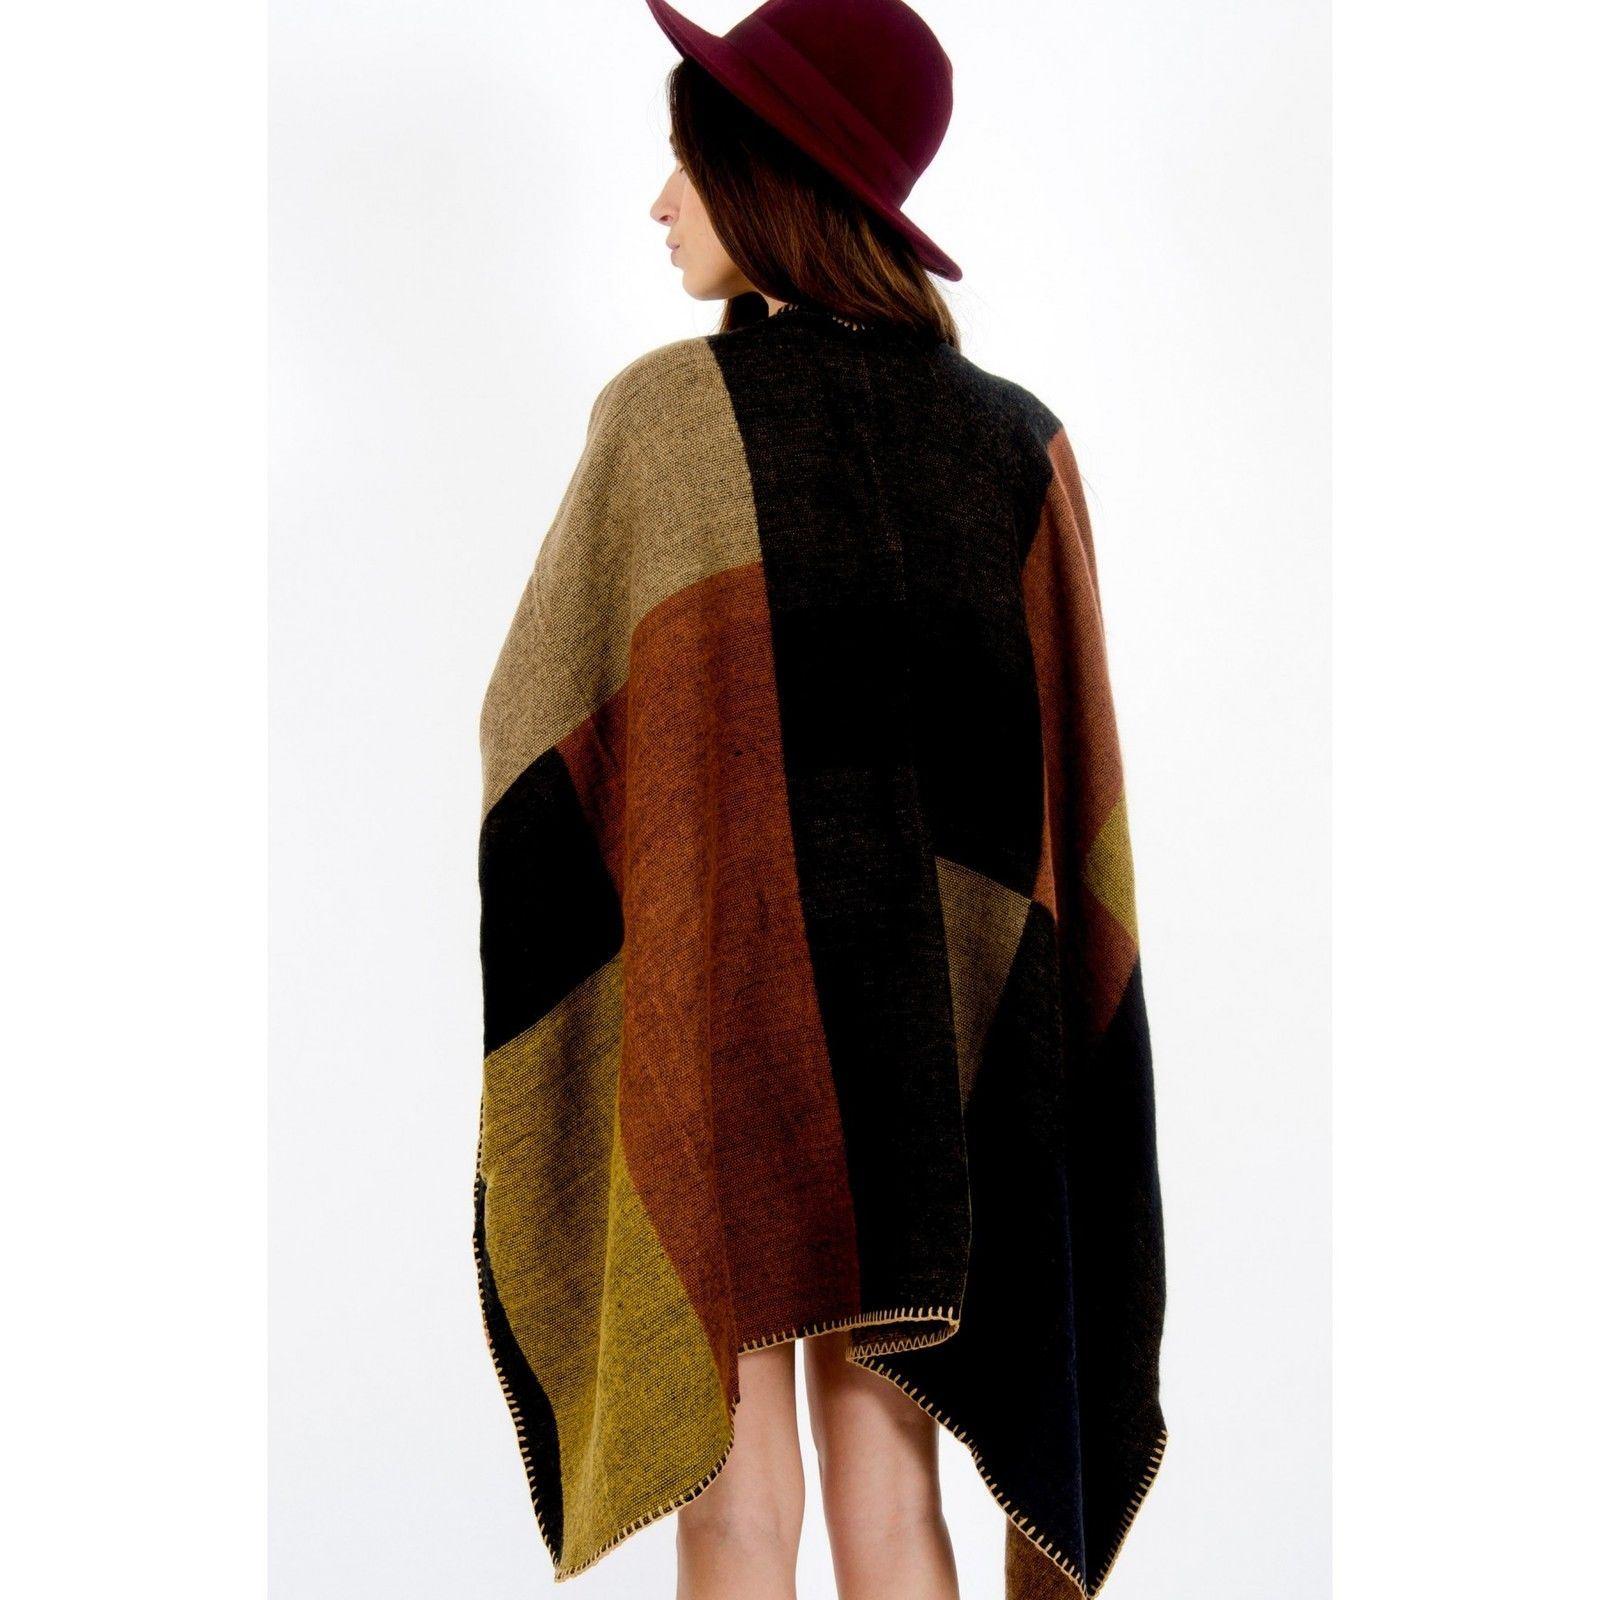 Ladies Womens Colour Block Check Blanket Cape Coat Winter Wrap Shawl 8 10 12 14